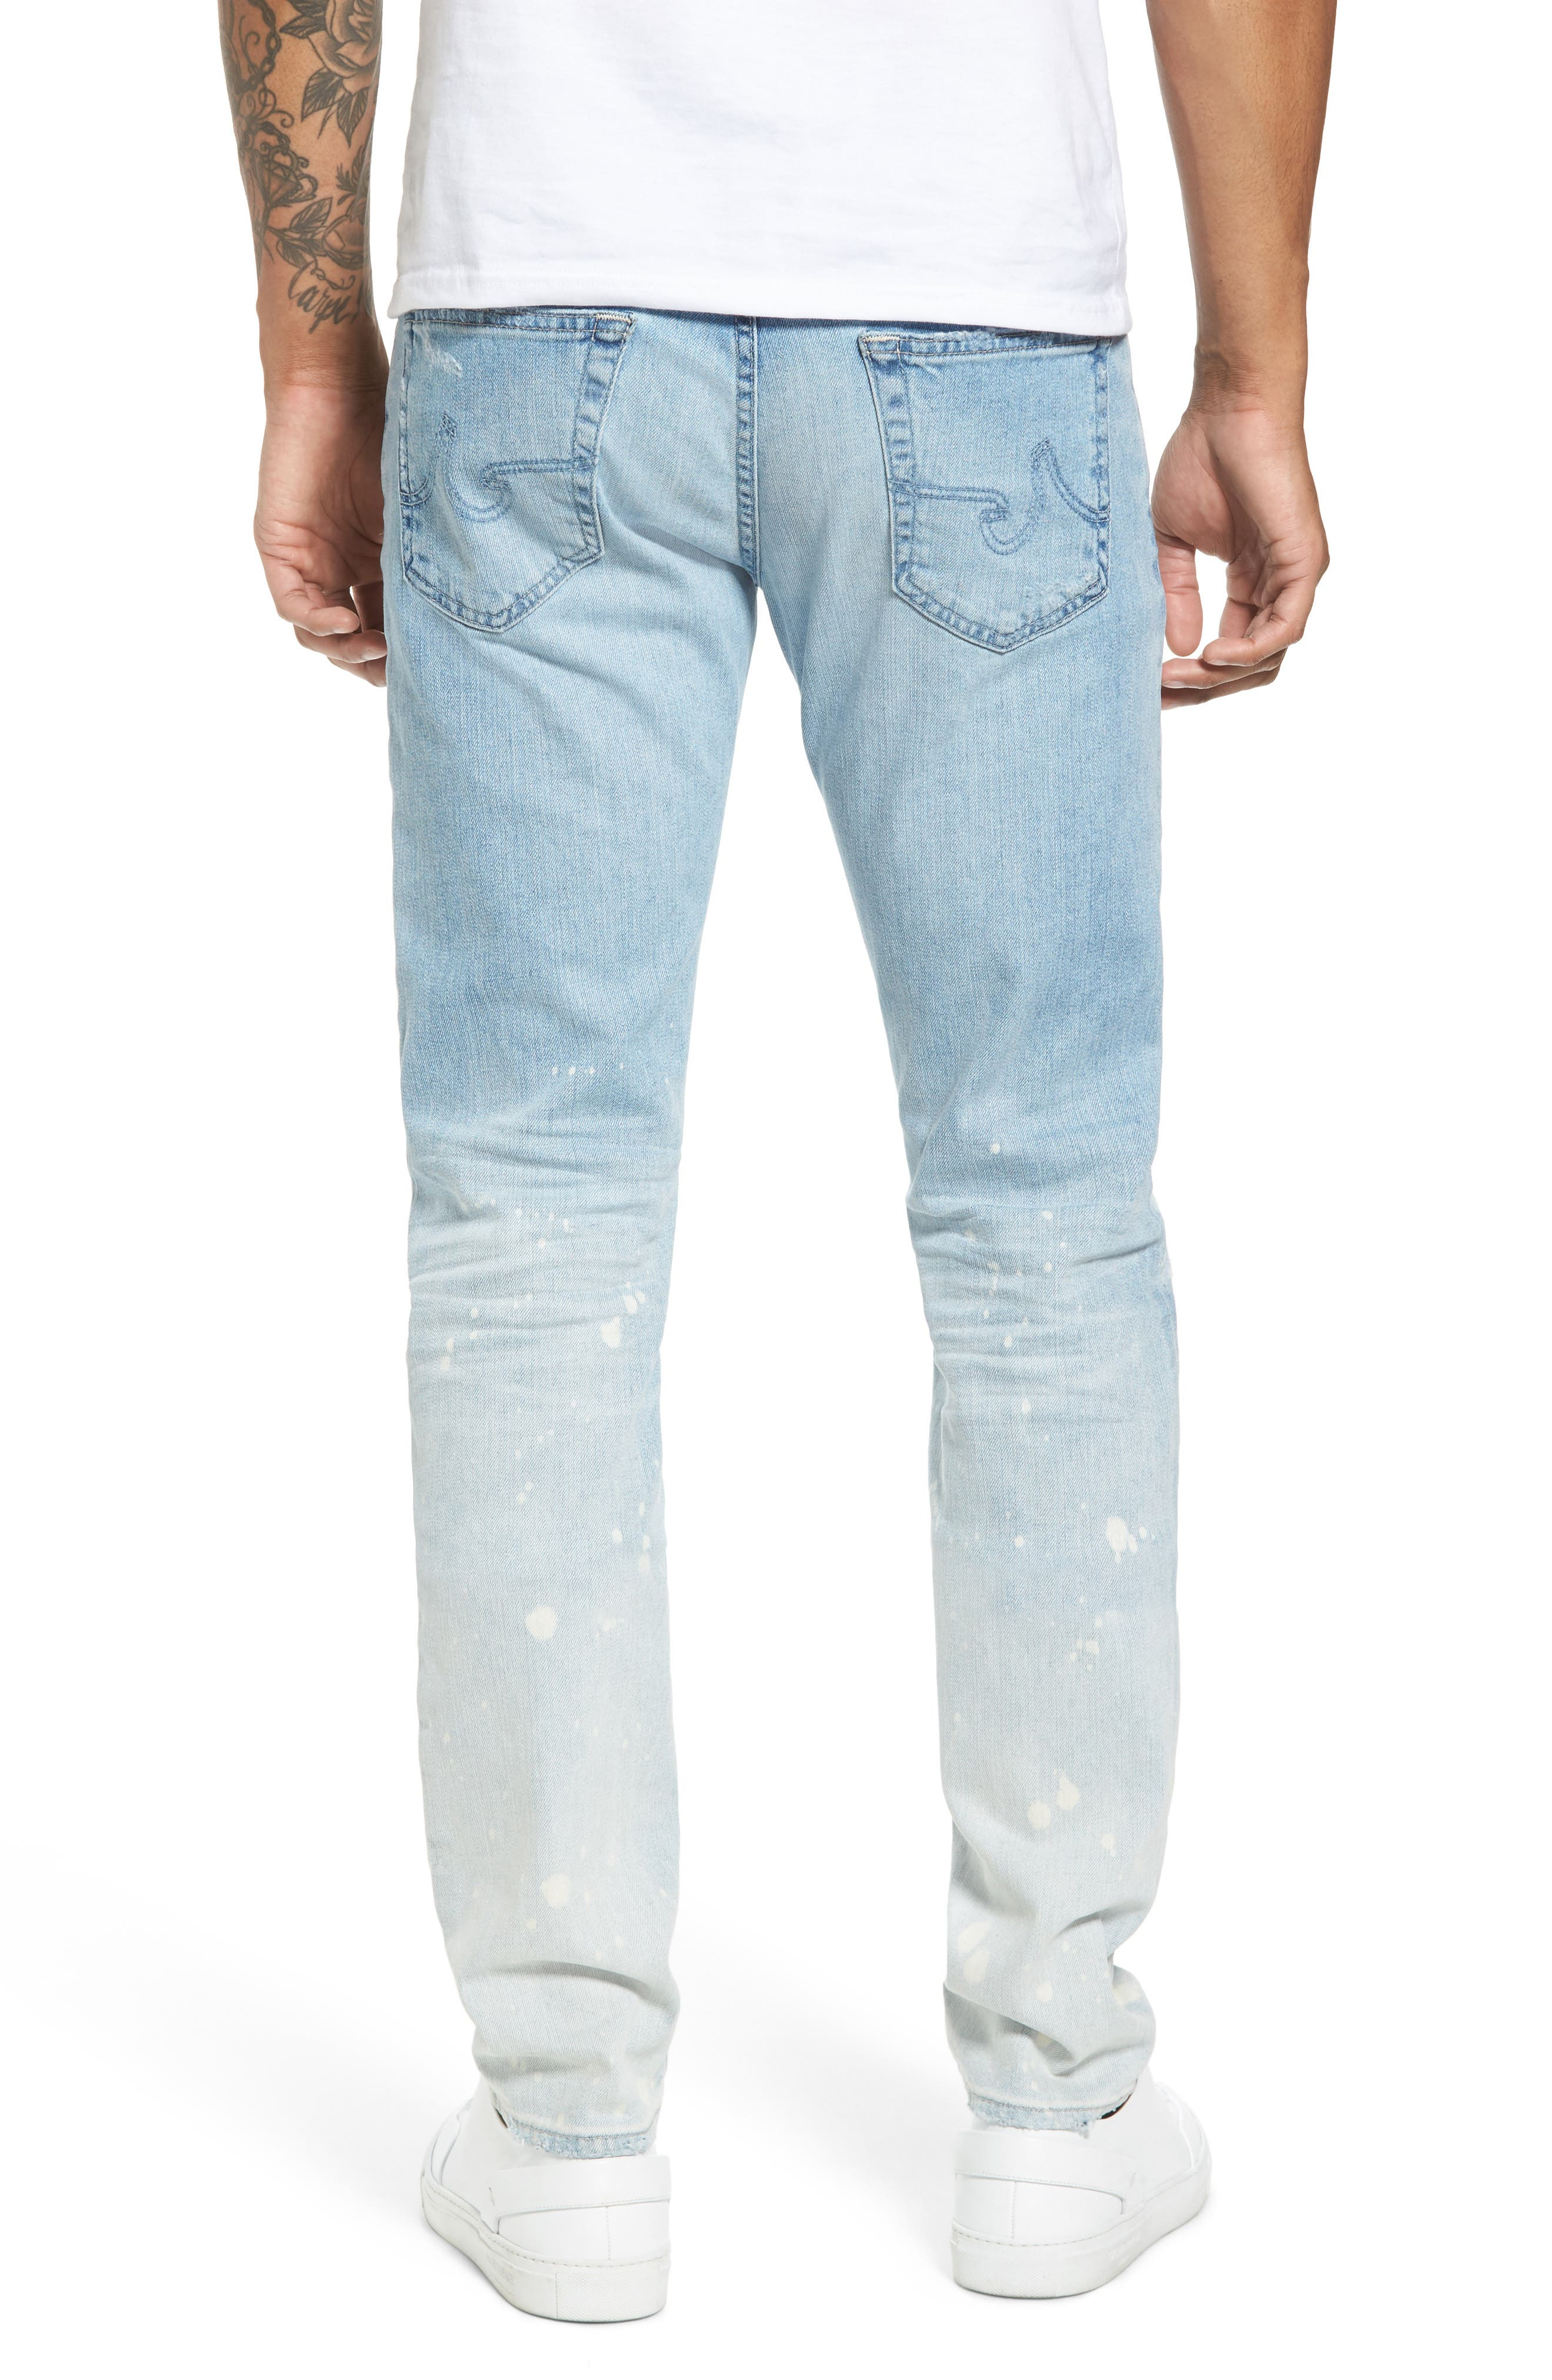 Dylan Slim Skinny Fit Jeans,                             Alternate thumbnail 2, color,                             23 Years Oceanside